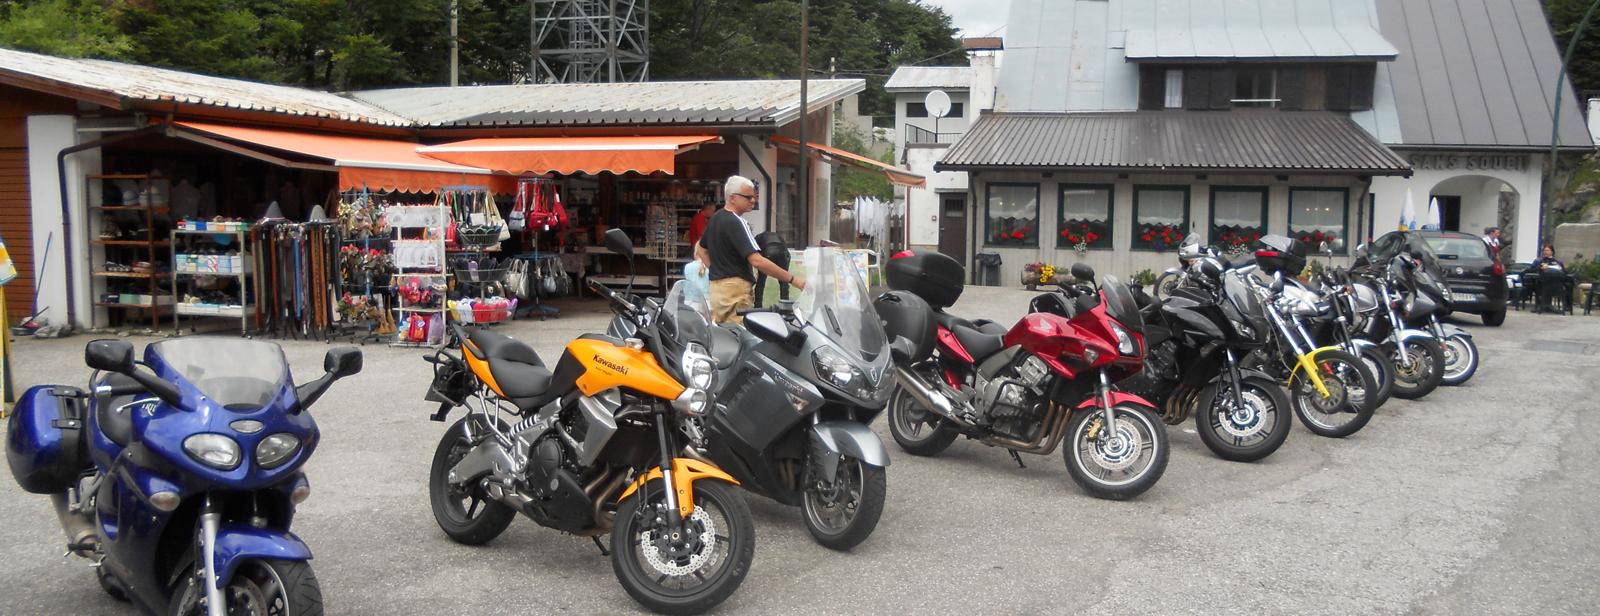 Lesergeschichten - Erlebnisse unserer Motorrad-Kolleg(inn)en